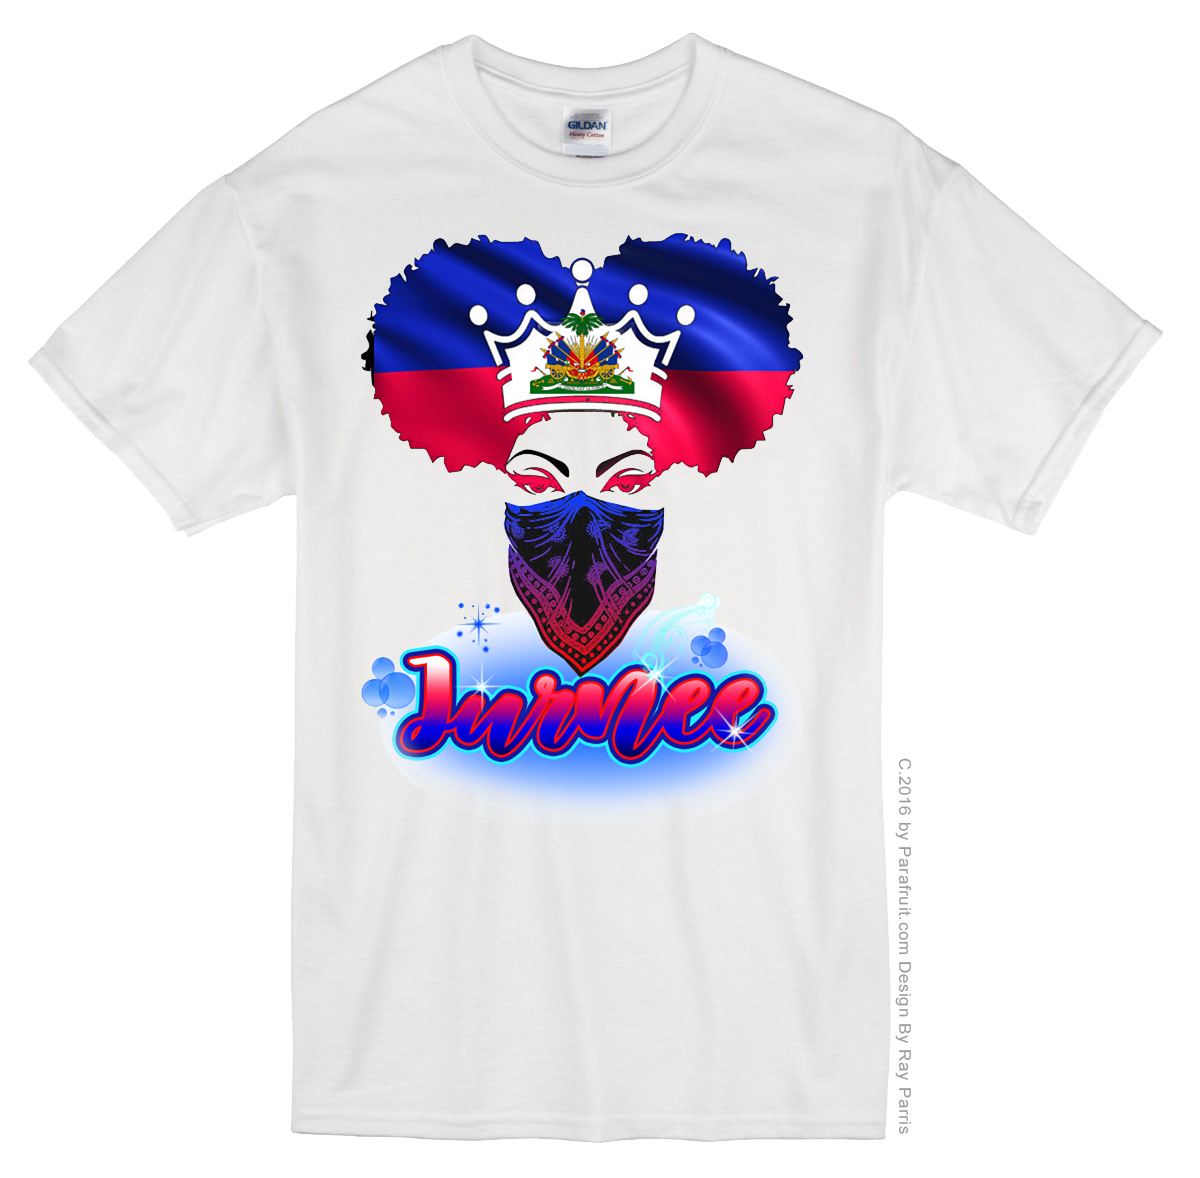 Airbrush Haiti G Girl Name 09870